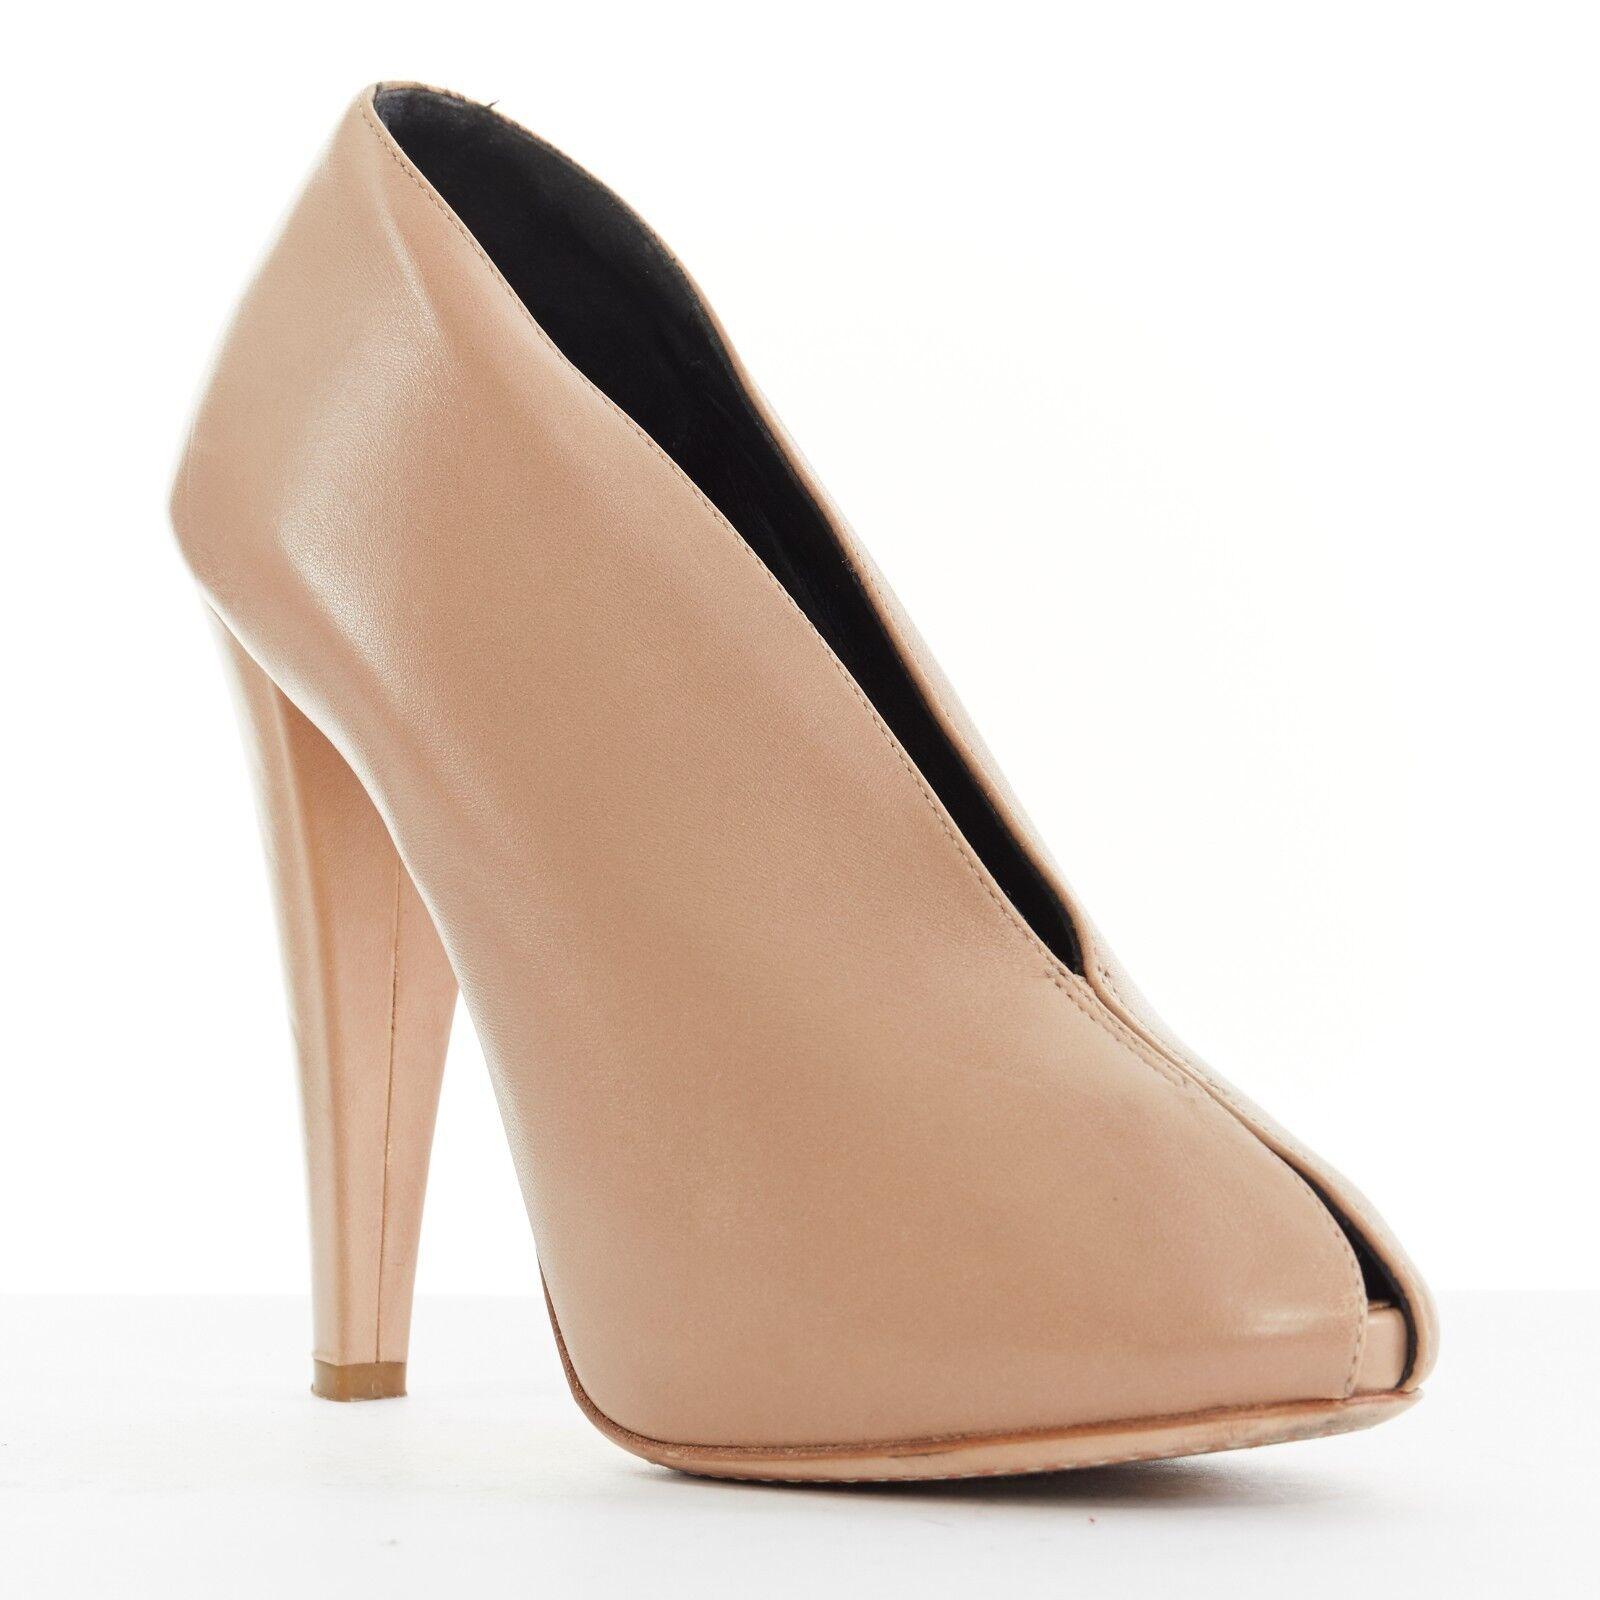 preferenziale CELINE PHILO nude soft leather V-neck slit peeptoe peeptoe peeptoe chunky high heel EU37 US7 UK4  negozio di vendita outlet